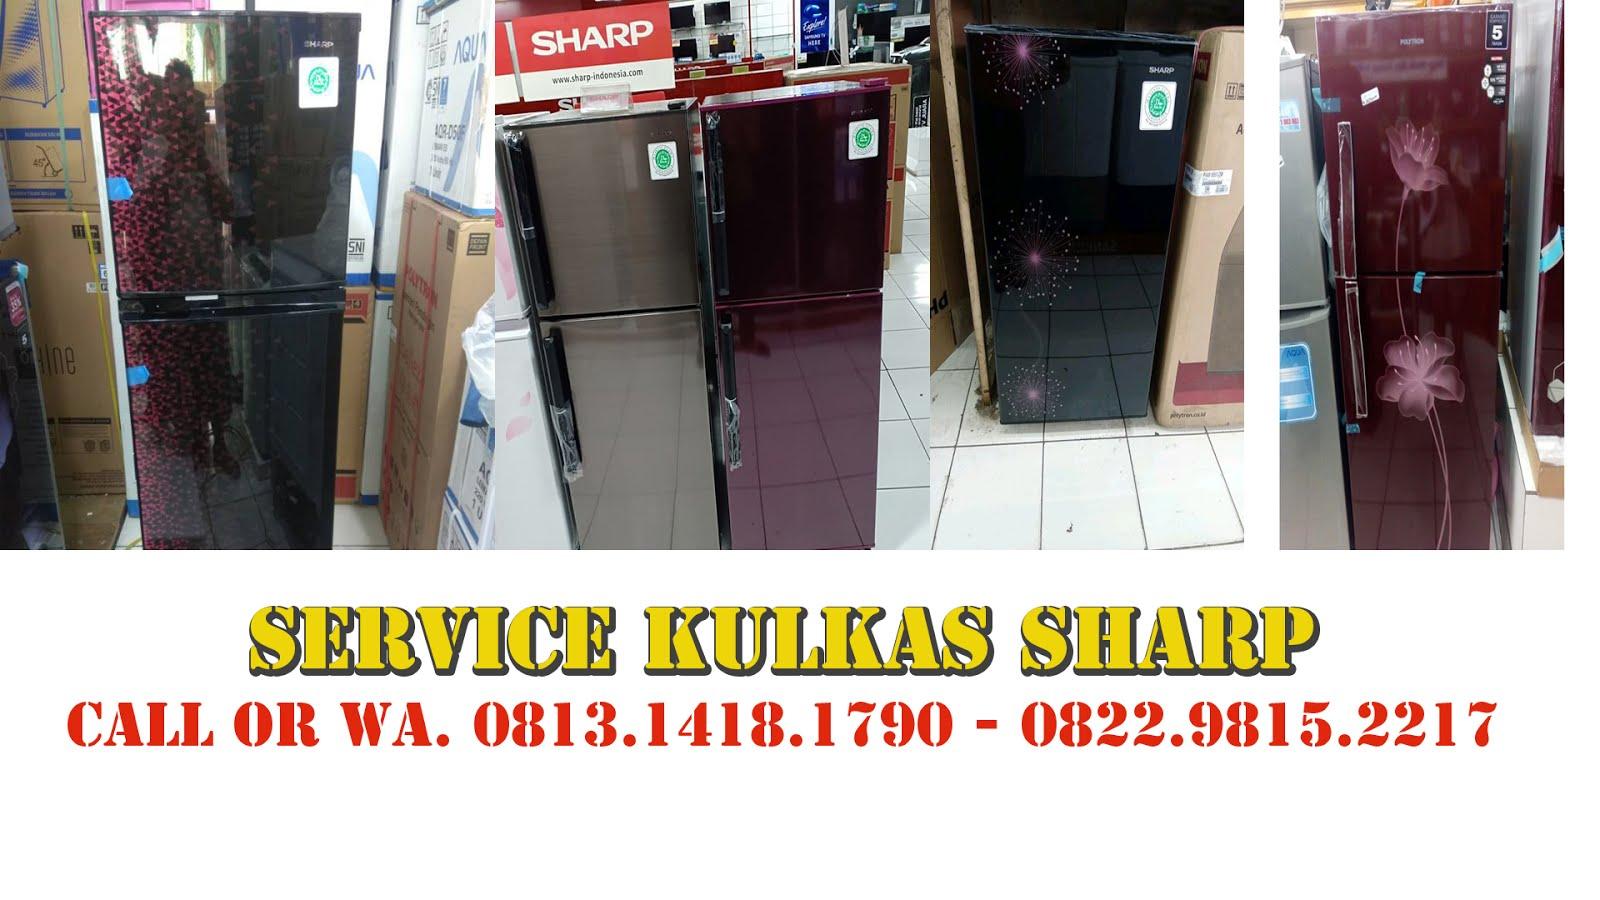 Service Kulkas Sharp Jakarta Pusat